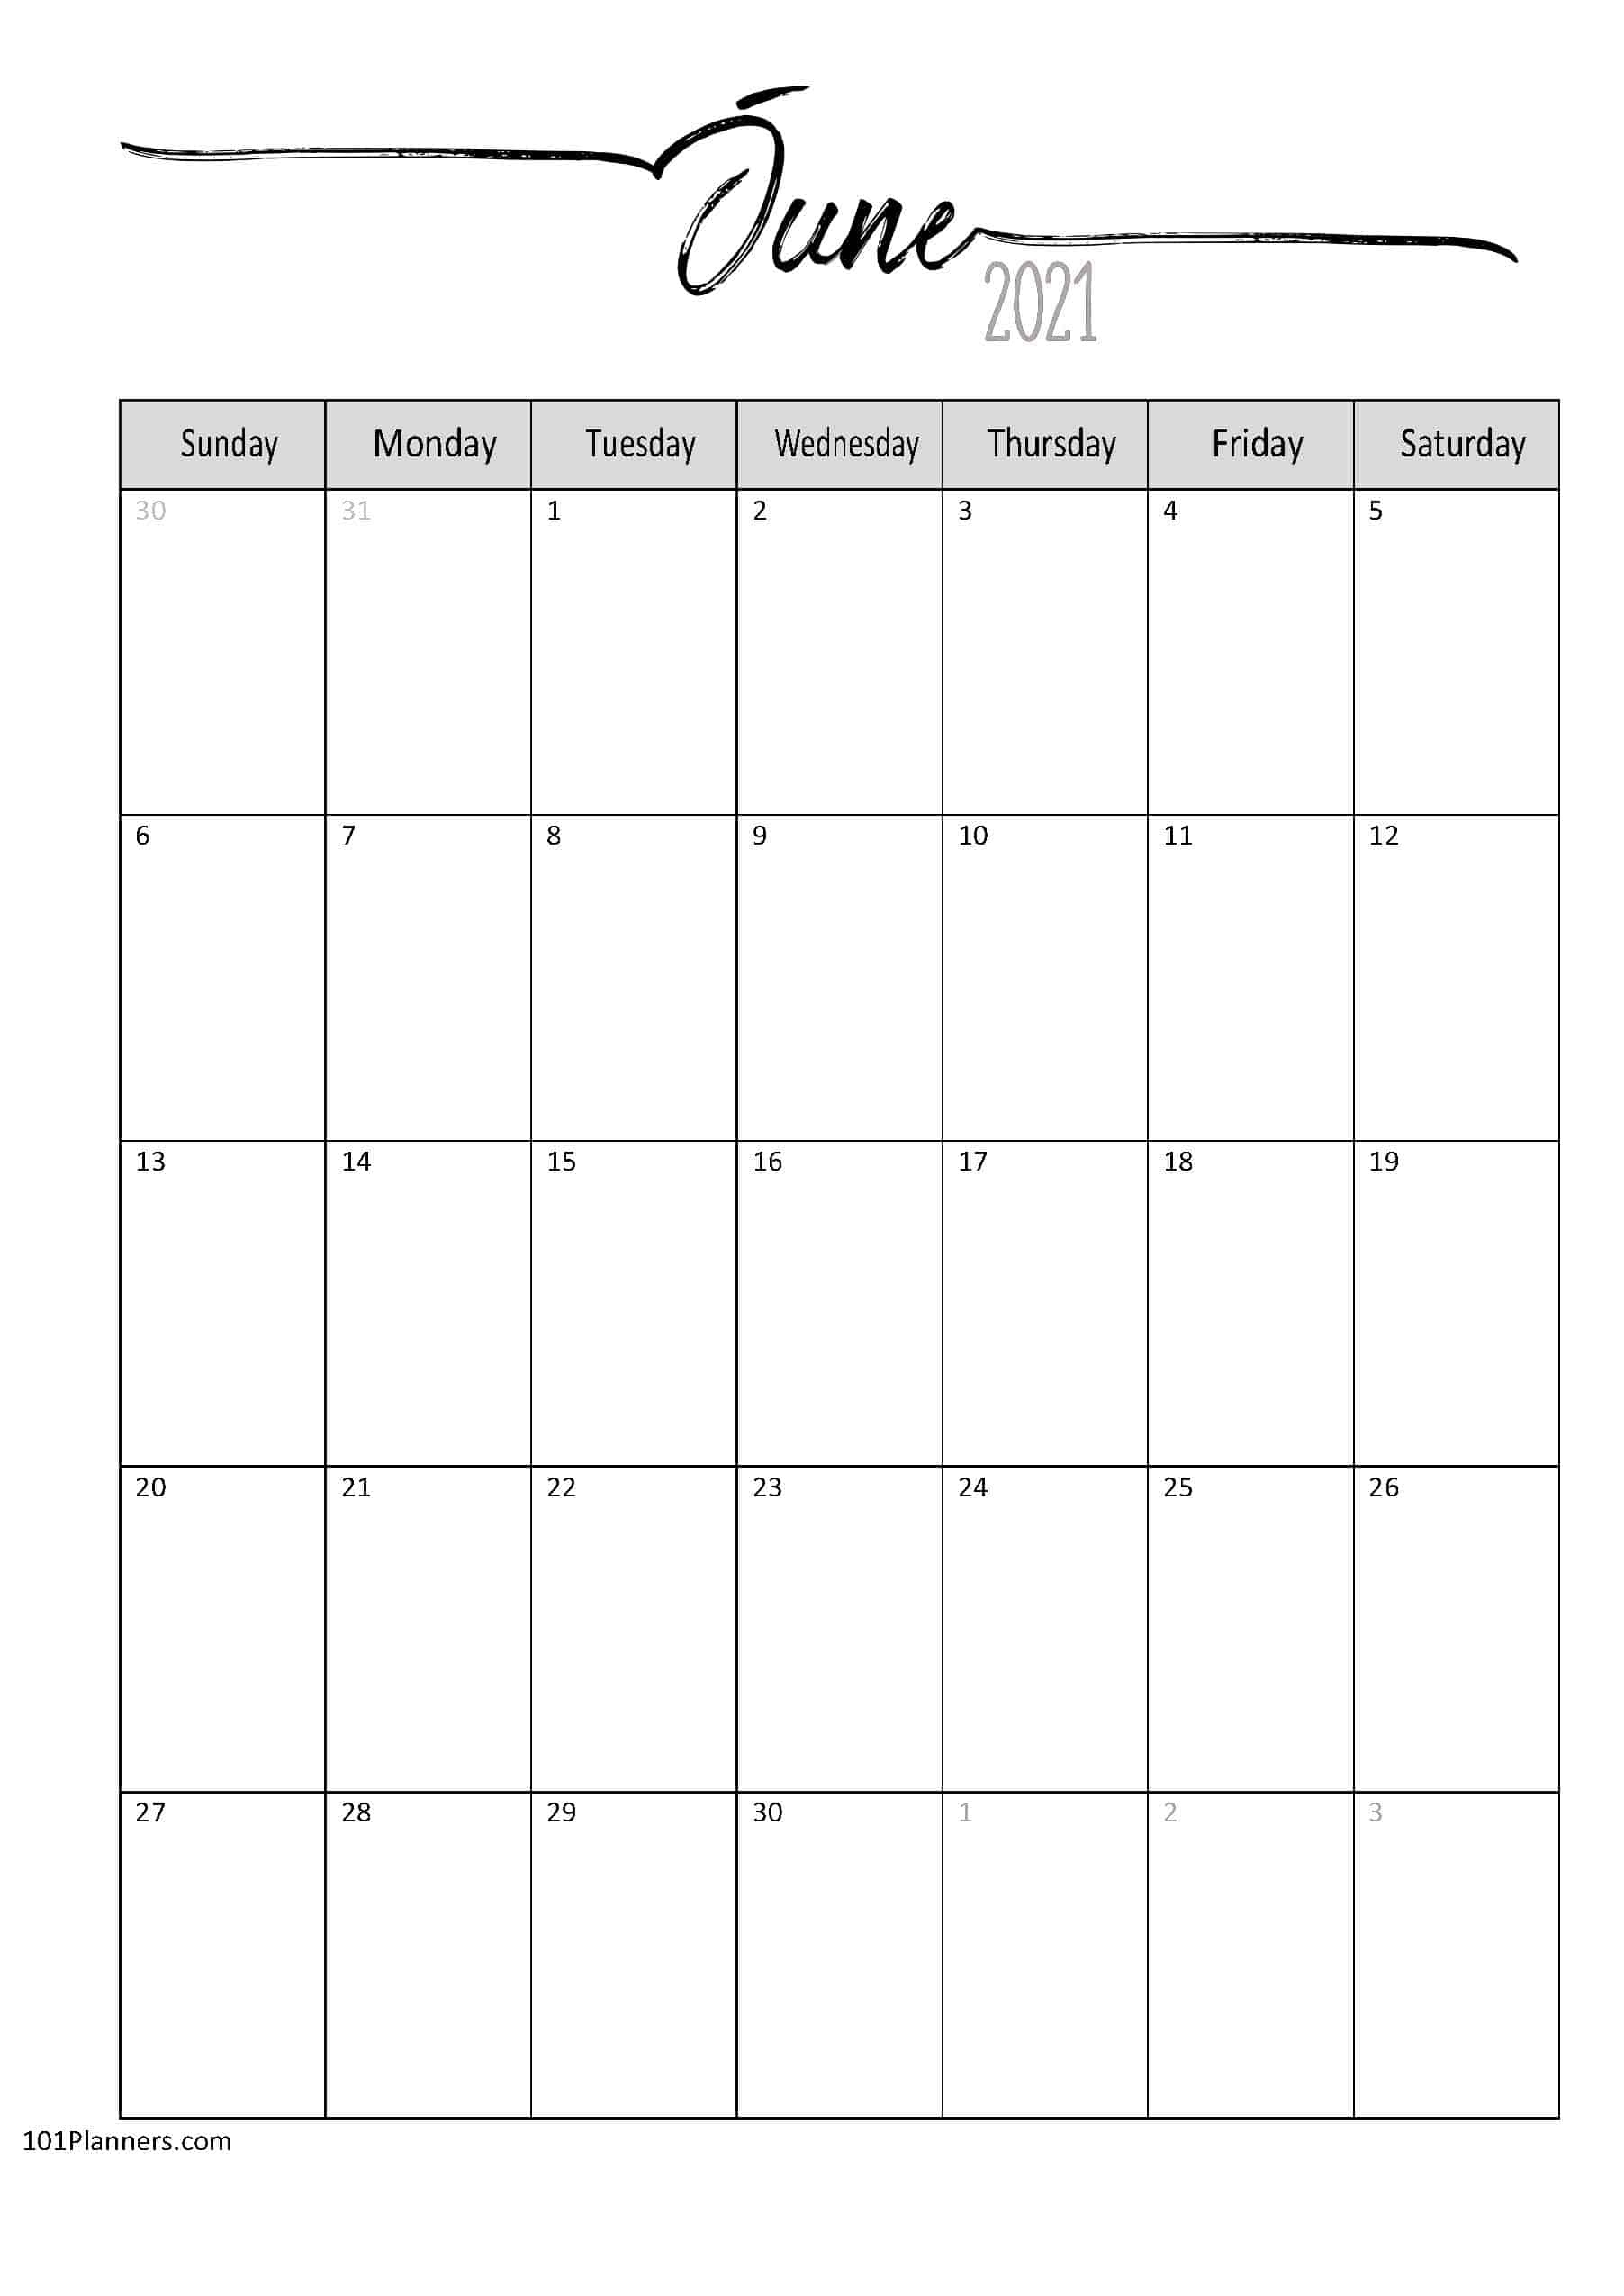 Free Printable June 2021 Calendar | Customize Online June 2021 Calendar In Excel